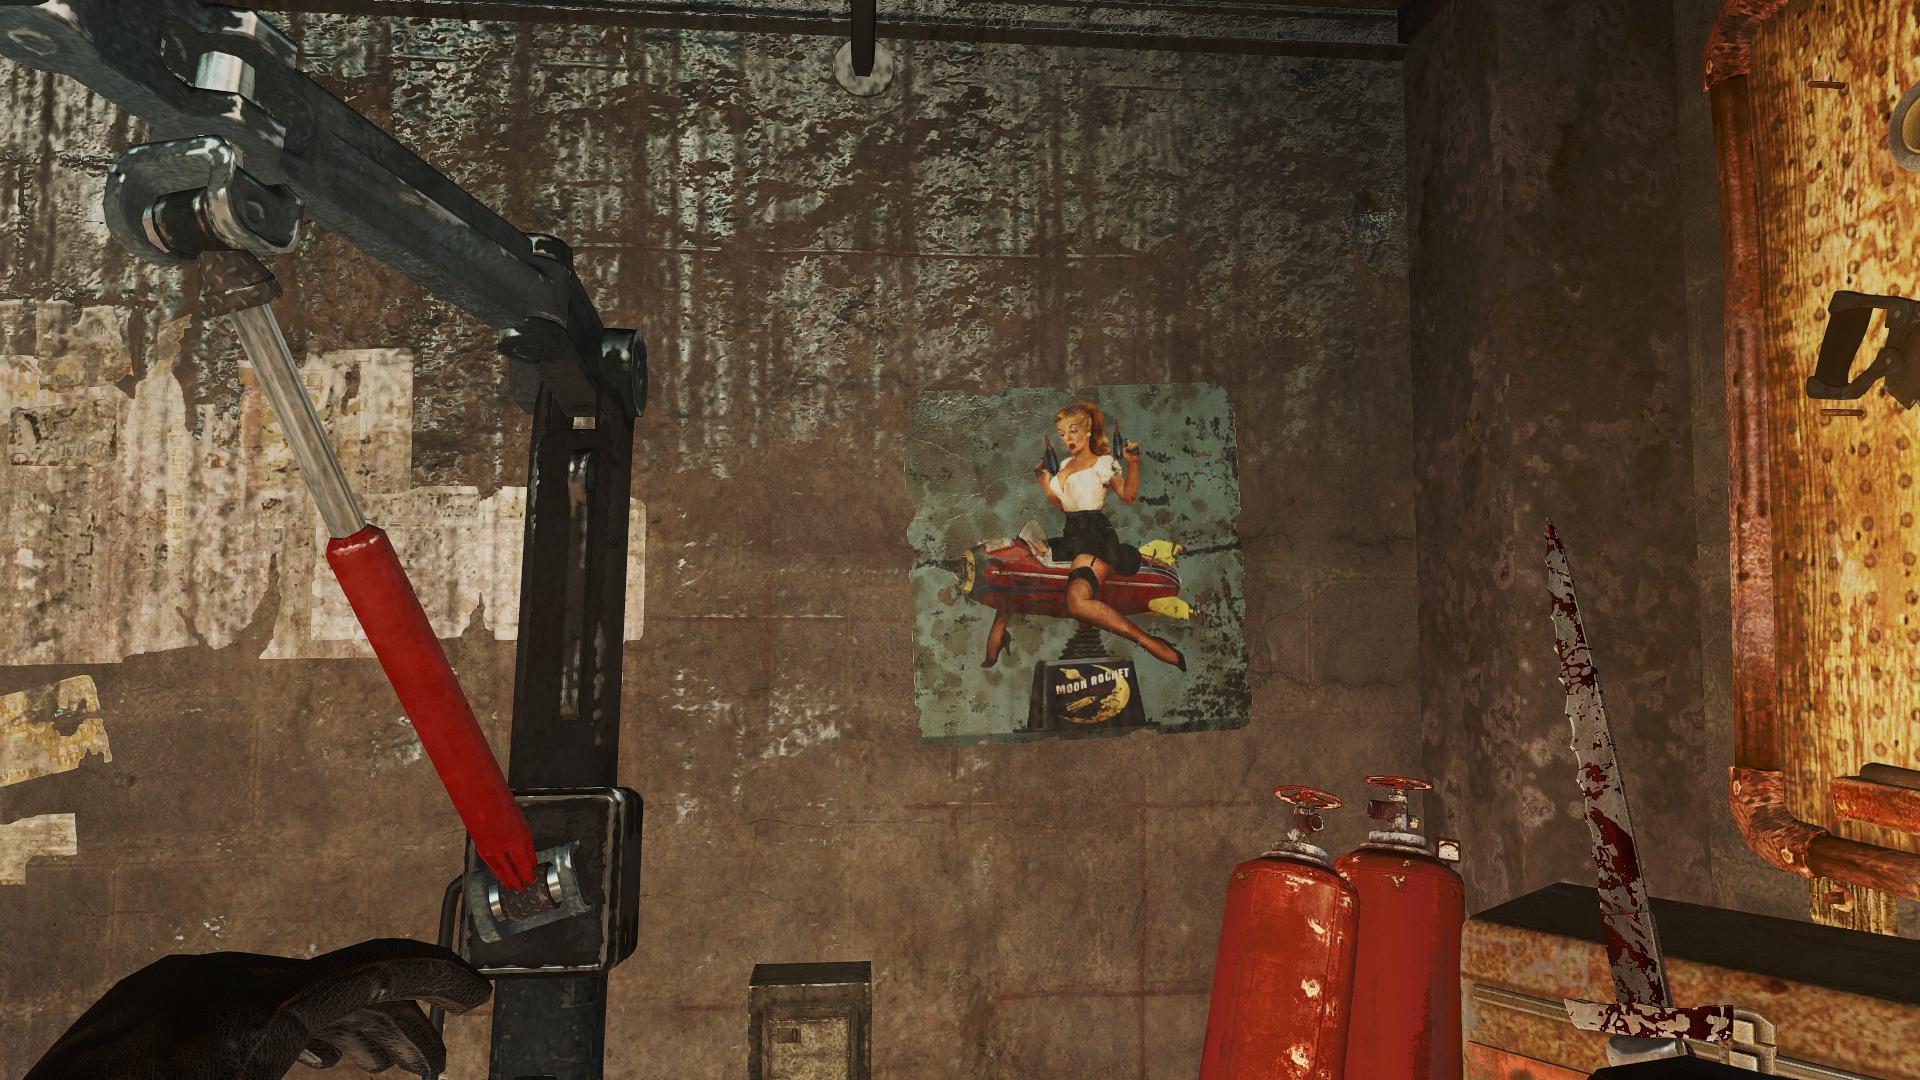 000361.Jpg - Fallout 4